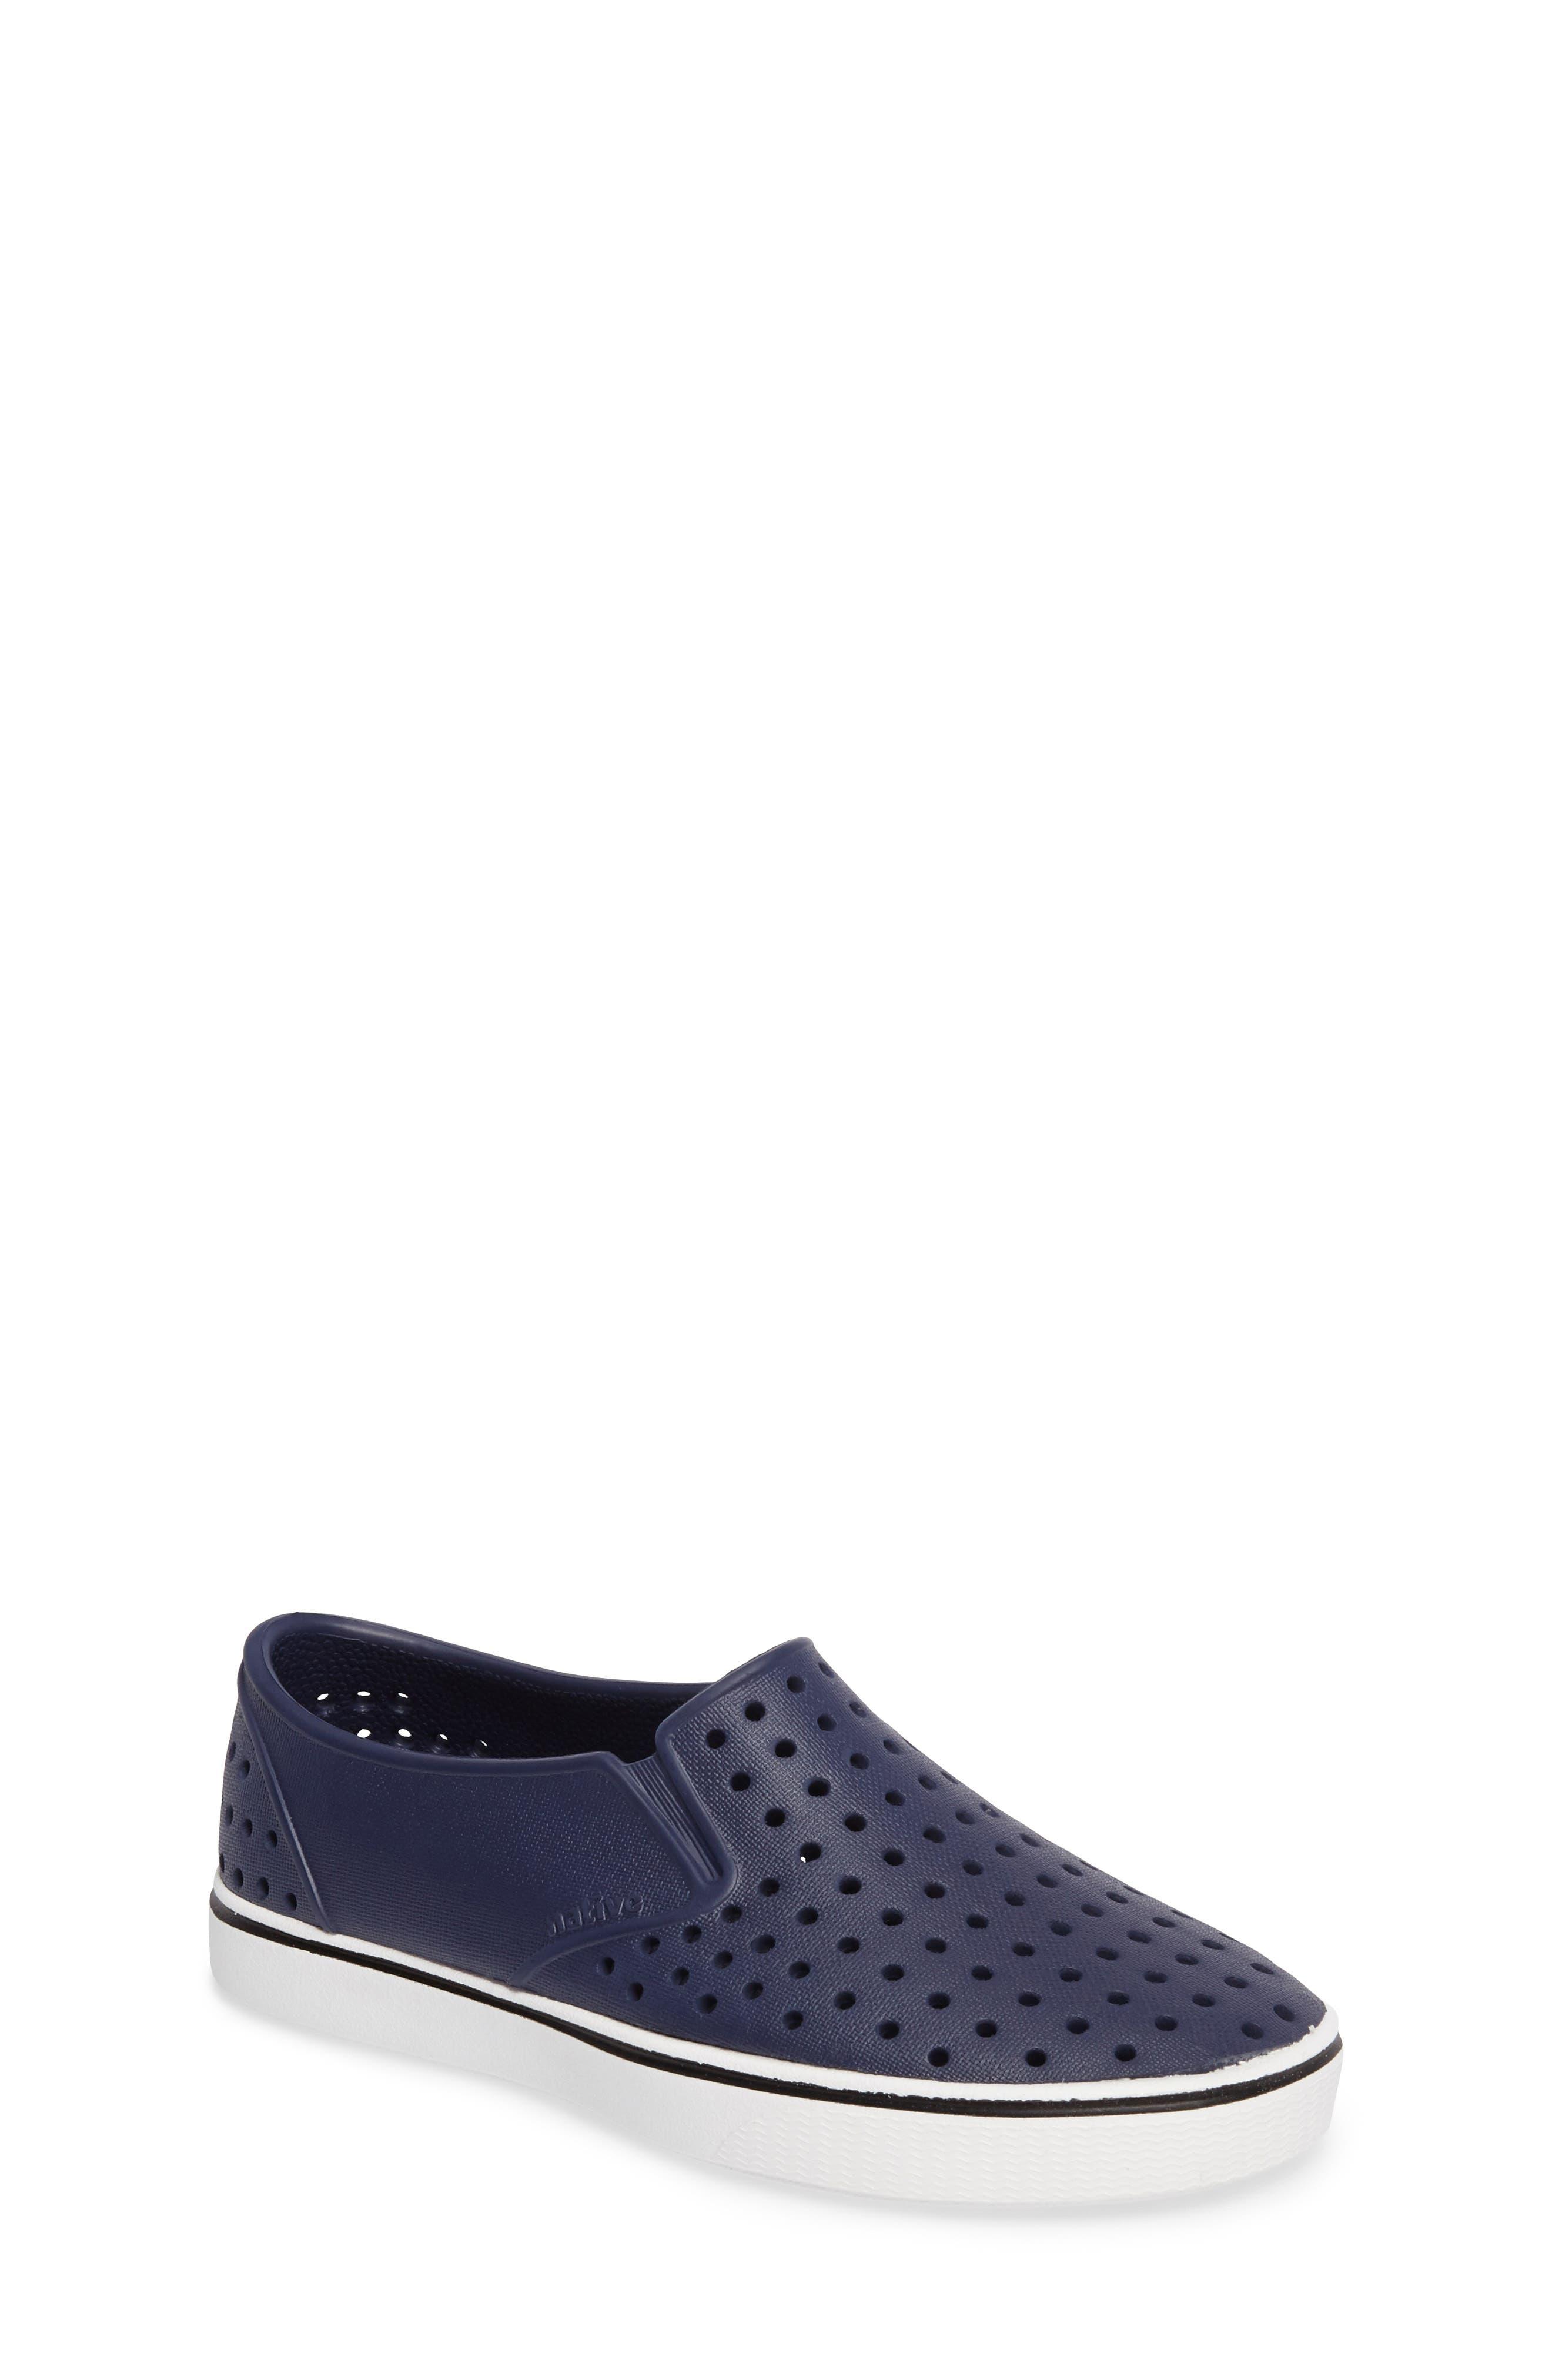 Miles Water Friendly Slip-On Sneaker,                             Main thumbnail 1, color,                             Regatta Blue/ Shell White